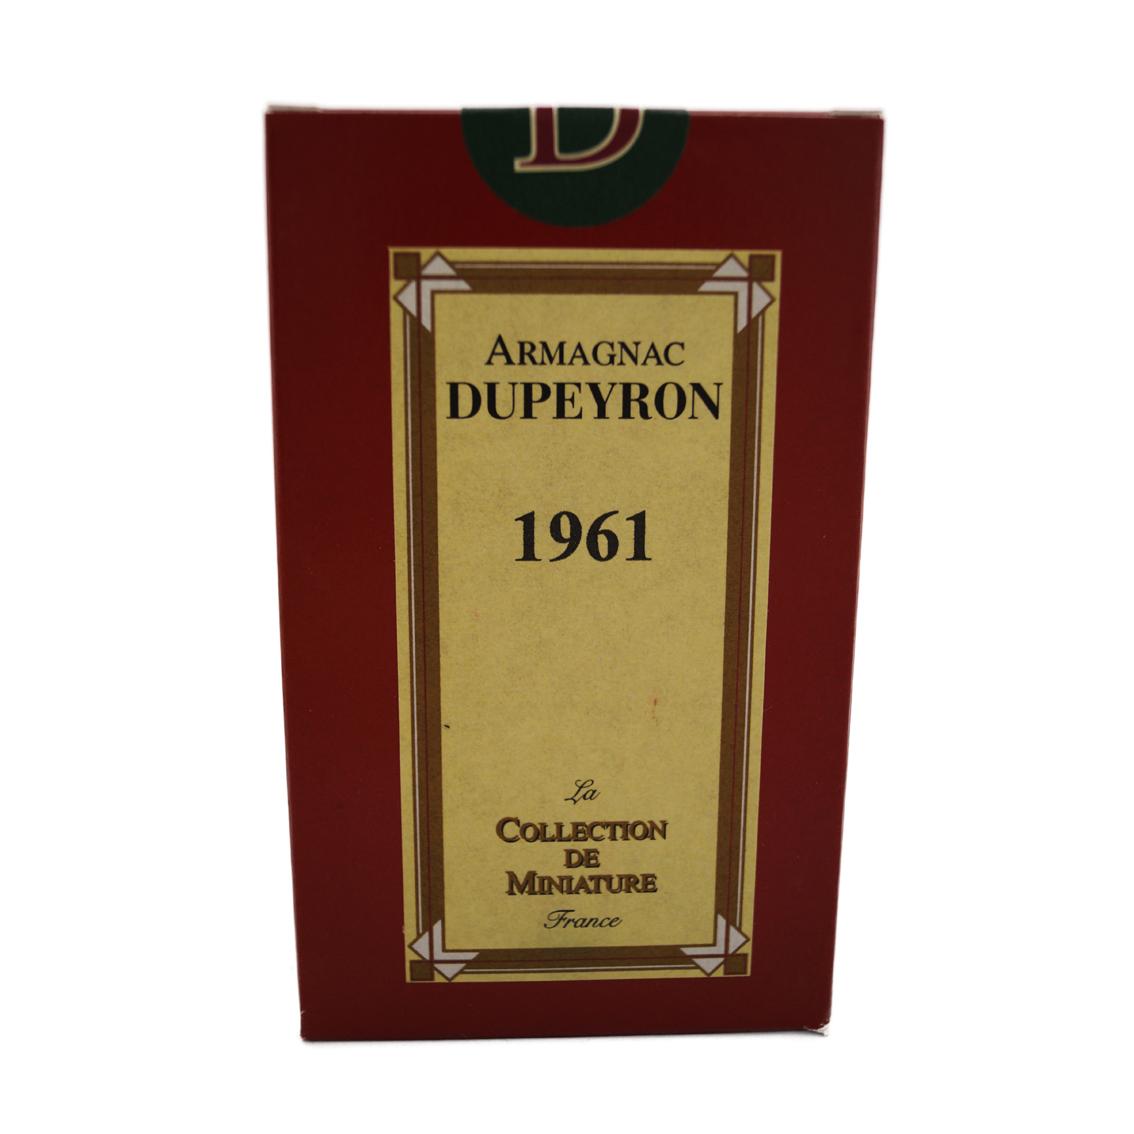 ARMAGNAC-DUPEYRON-1961-B